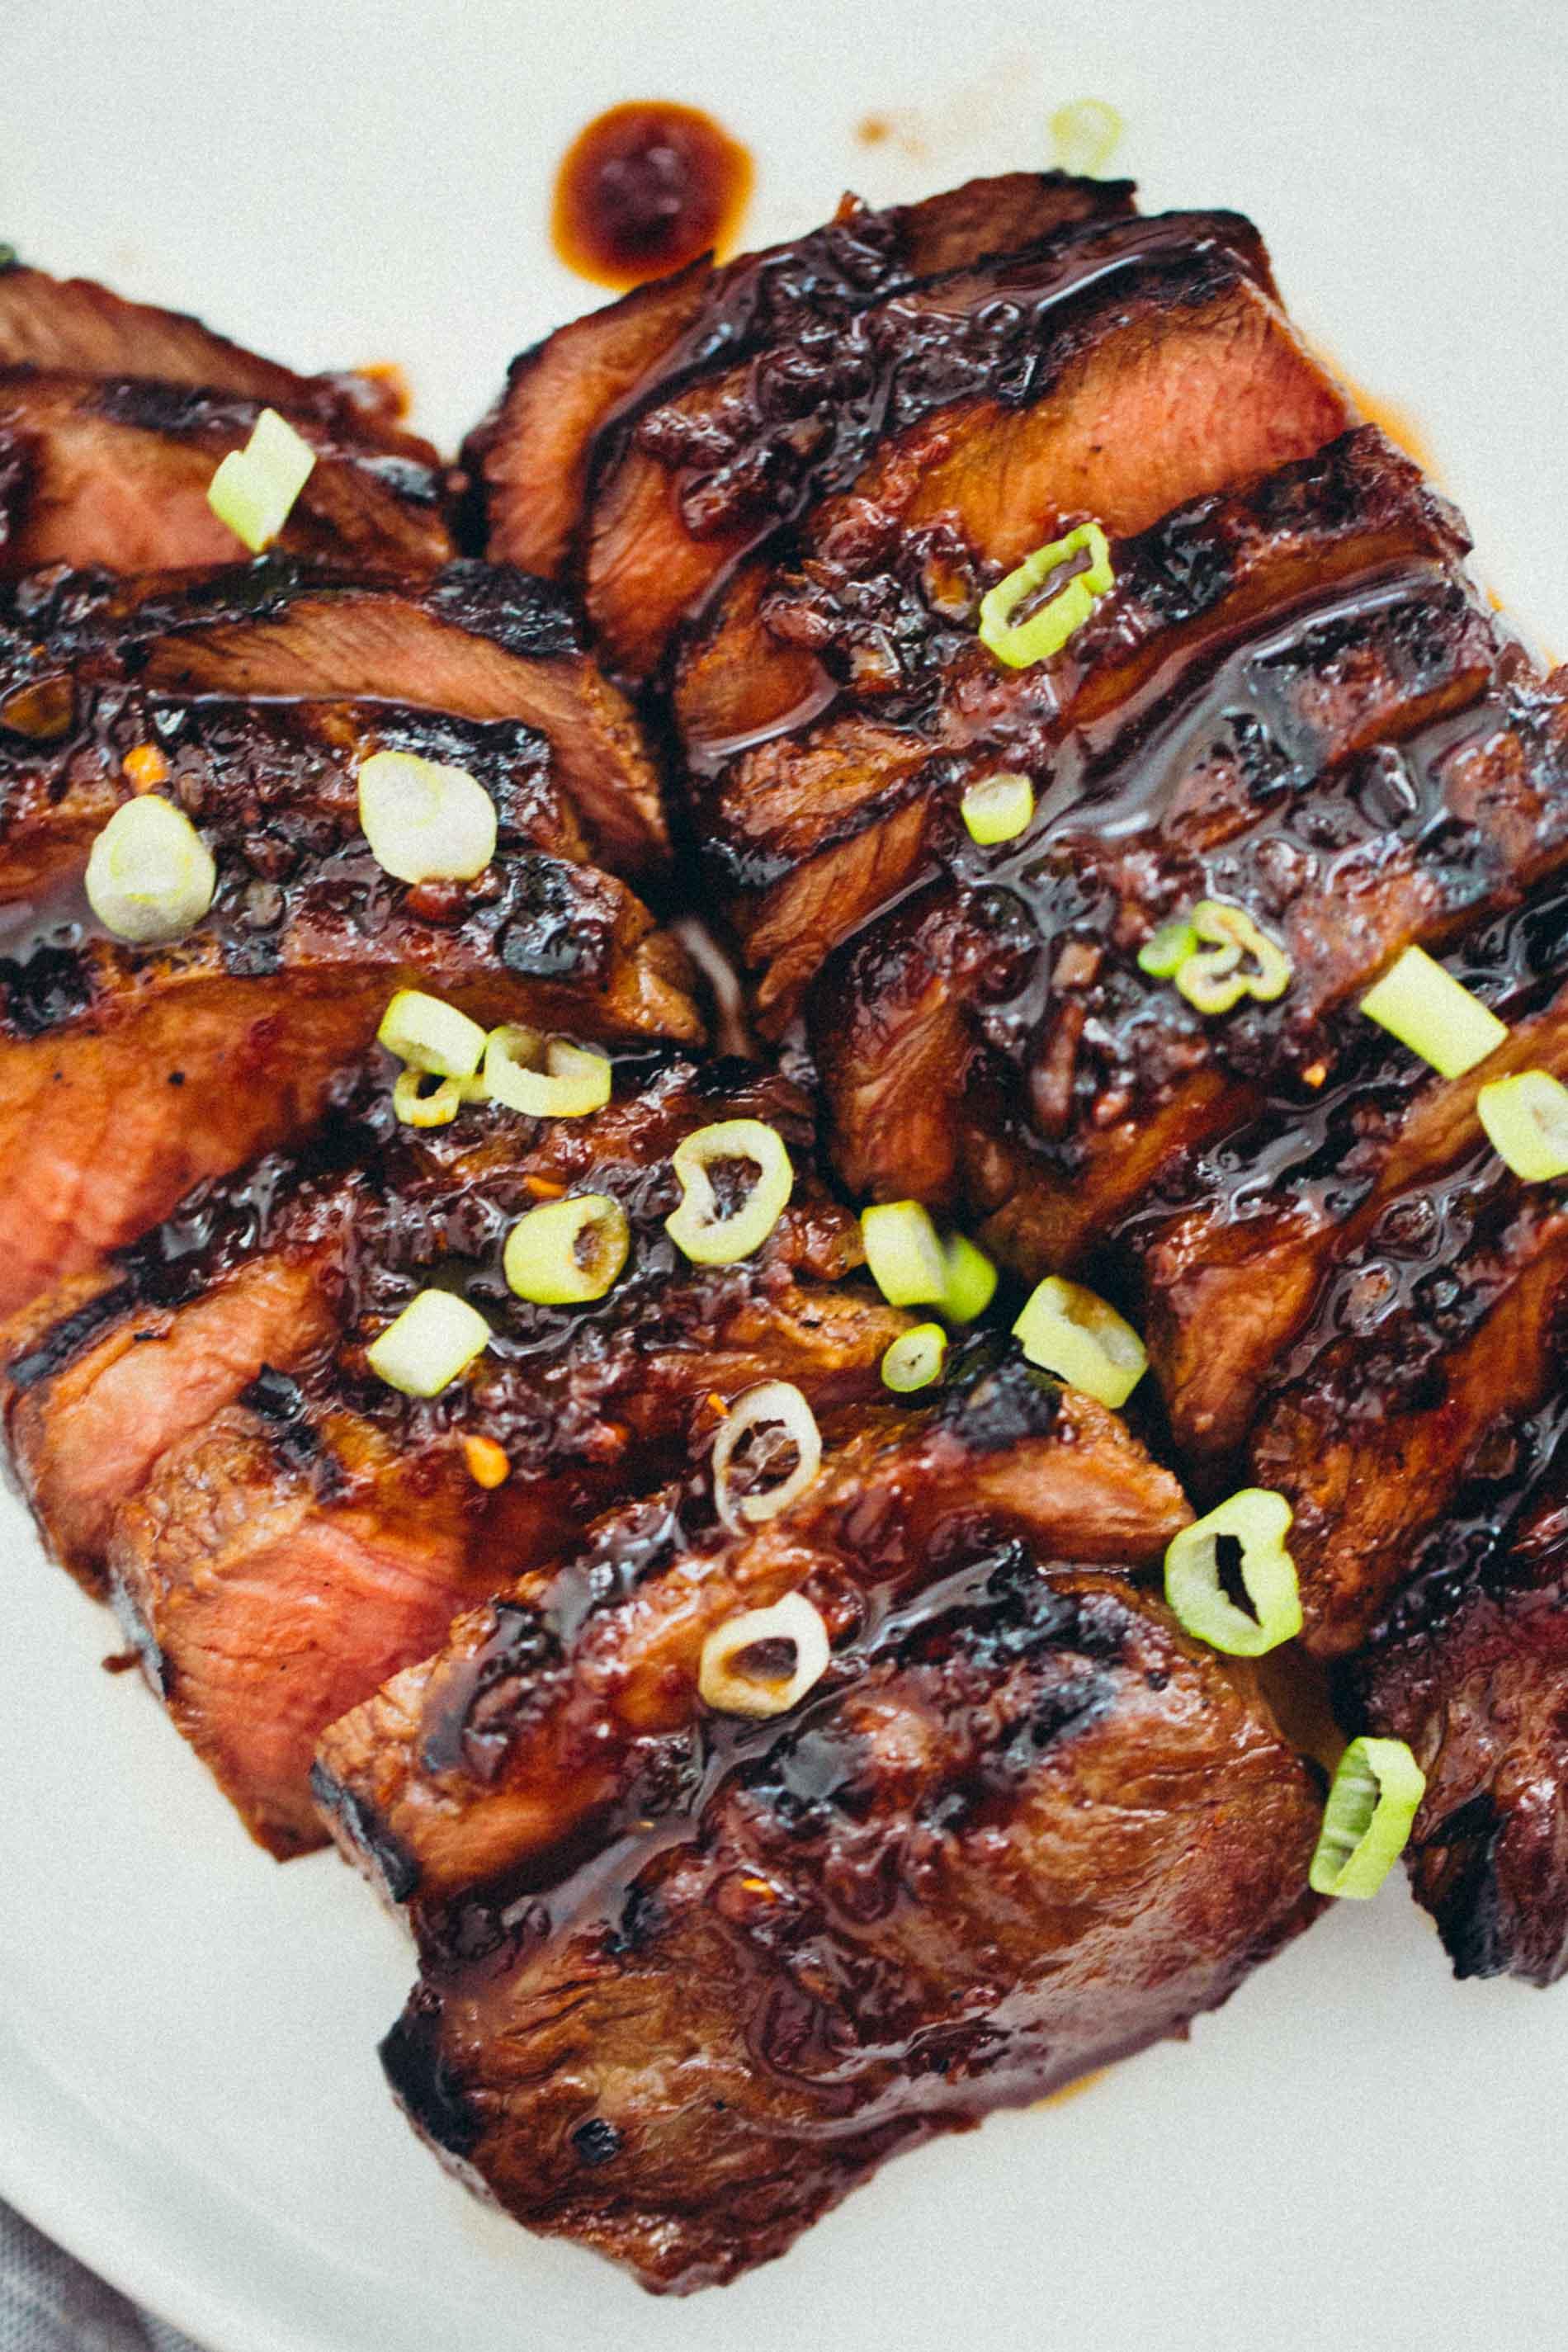 Grilled Asian Marinated Flat Iron Steak Grilled Flat Iron Steak Recipe